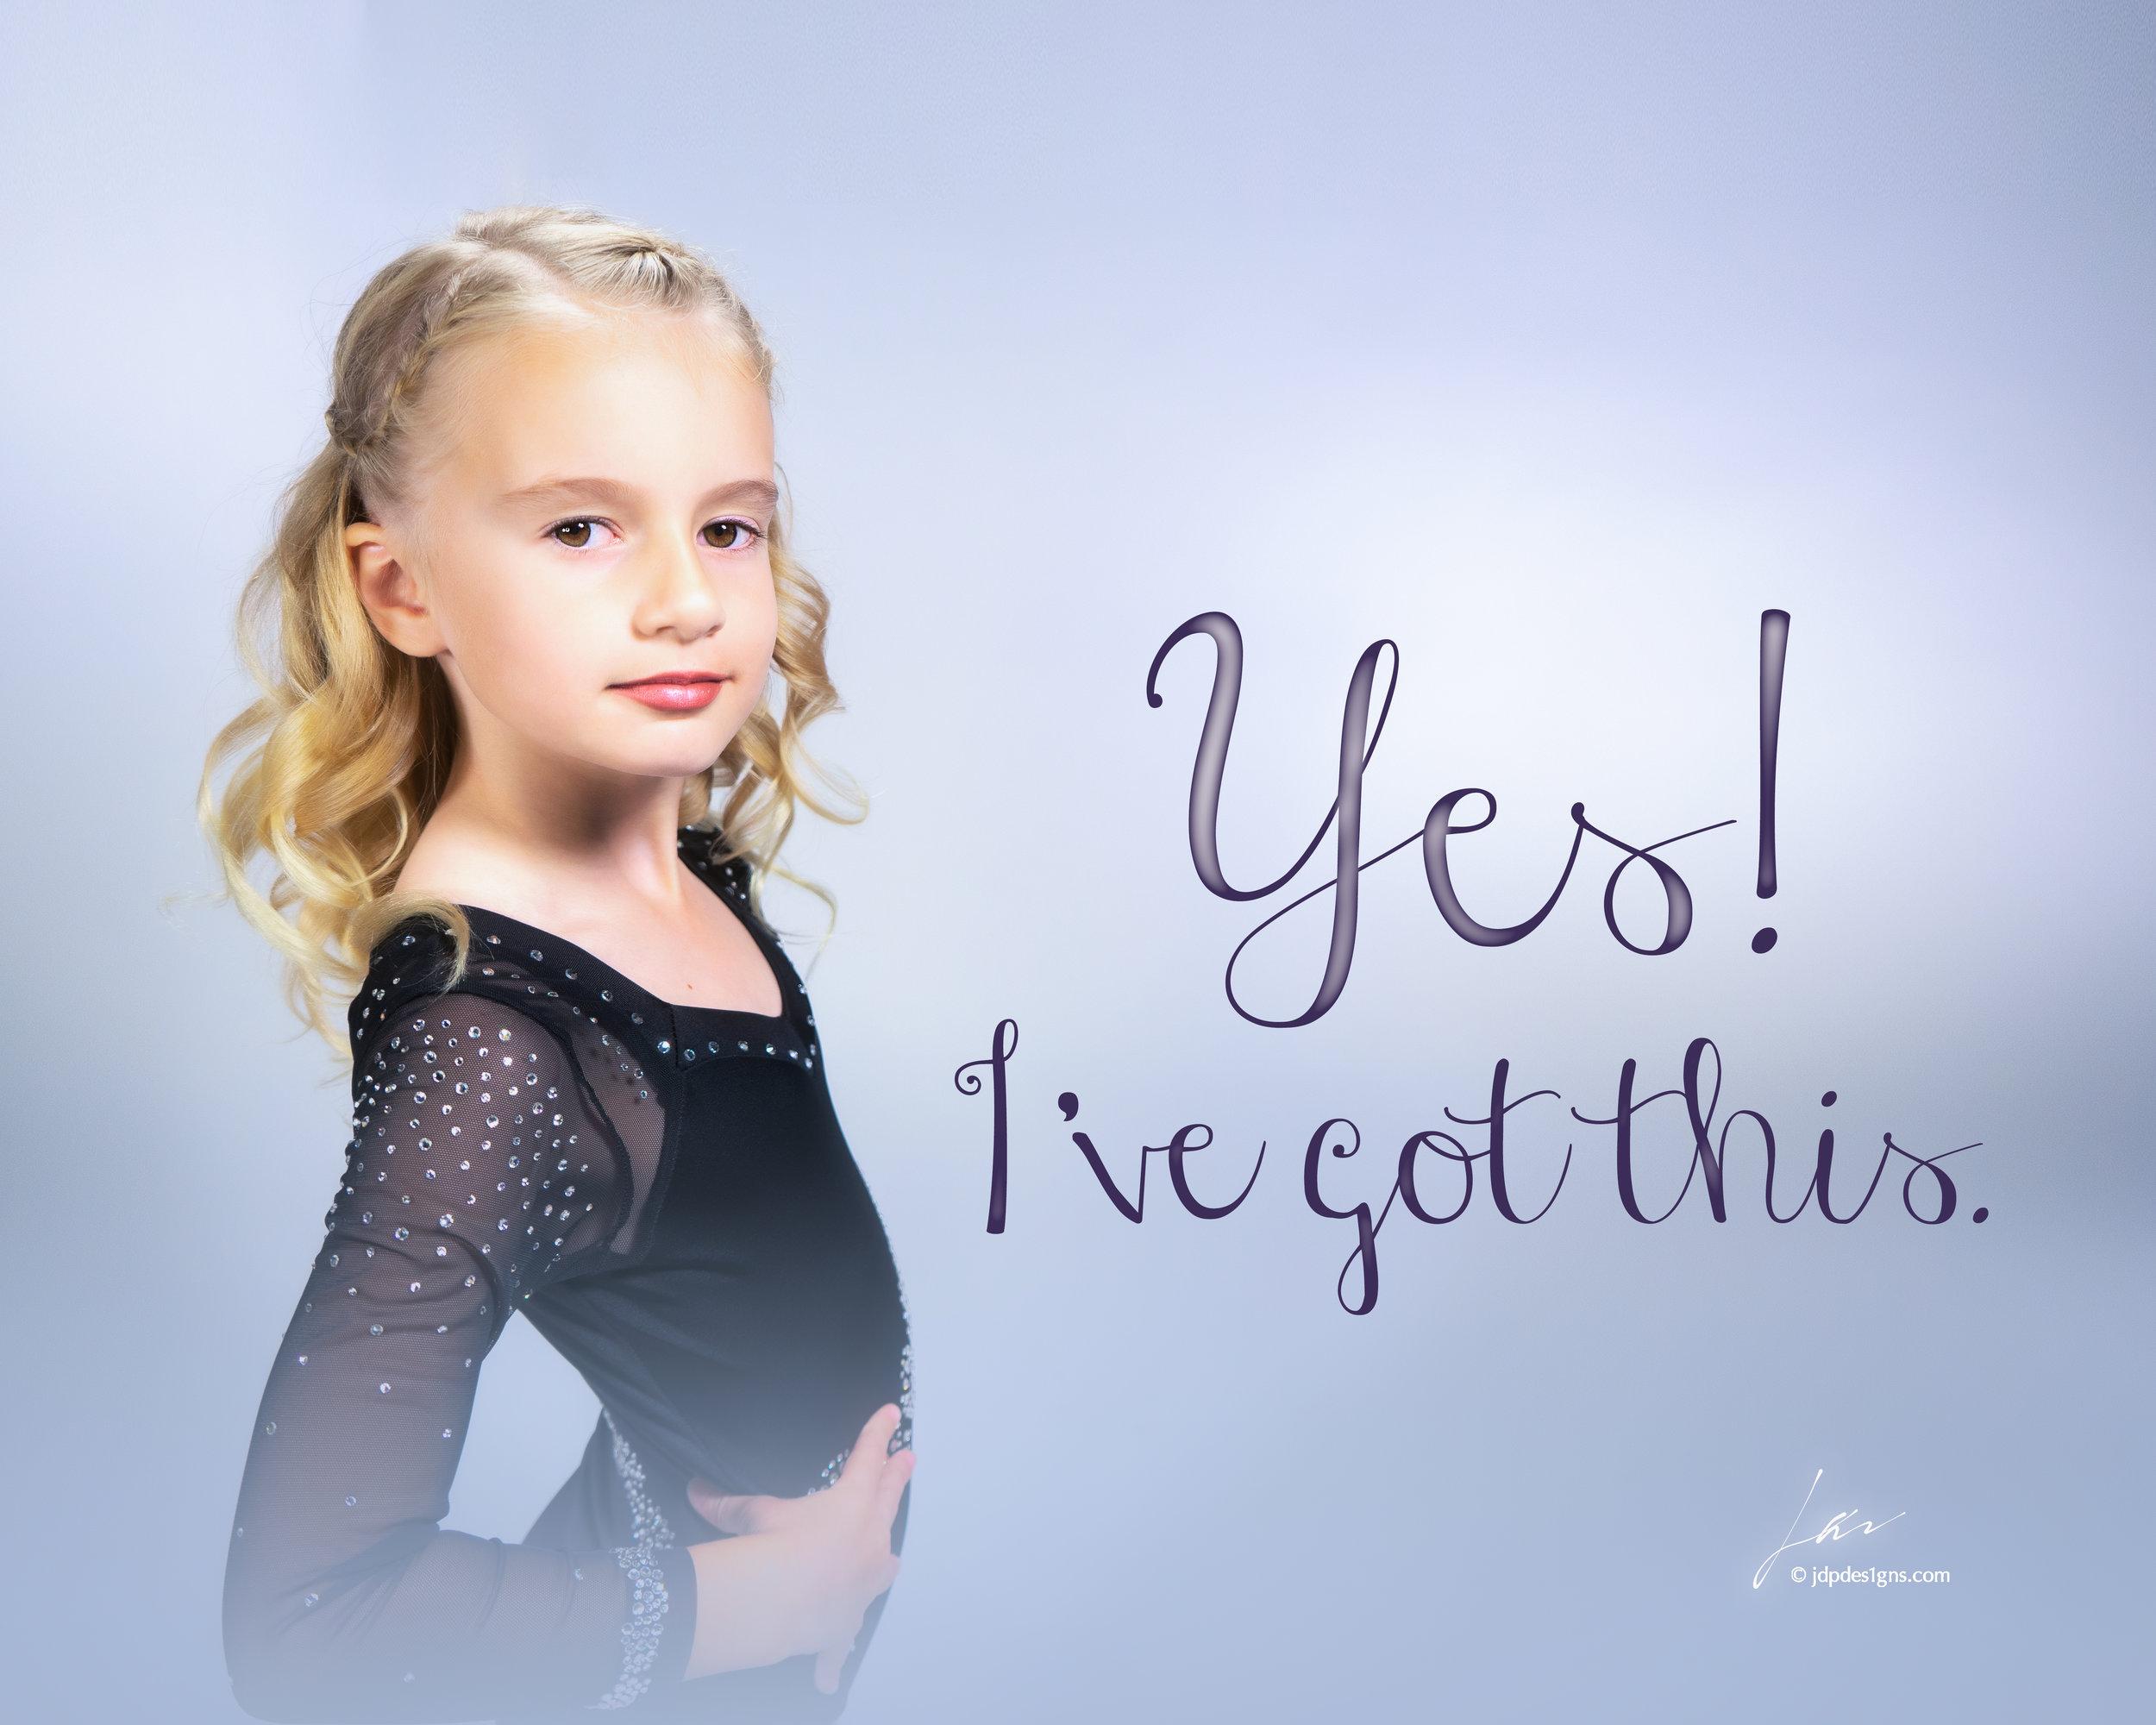 Chloe Poster.jpg